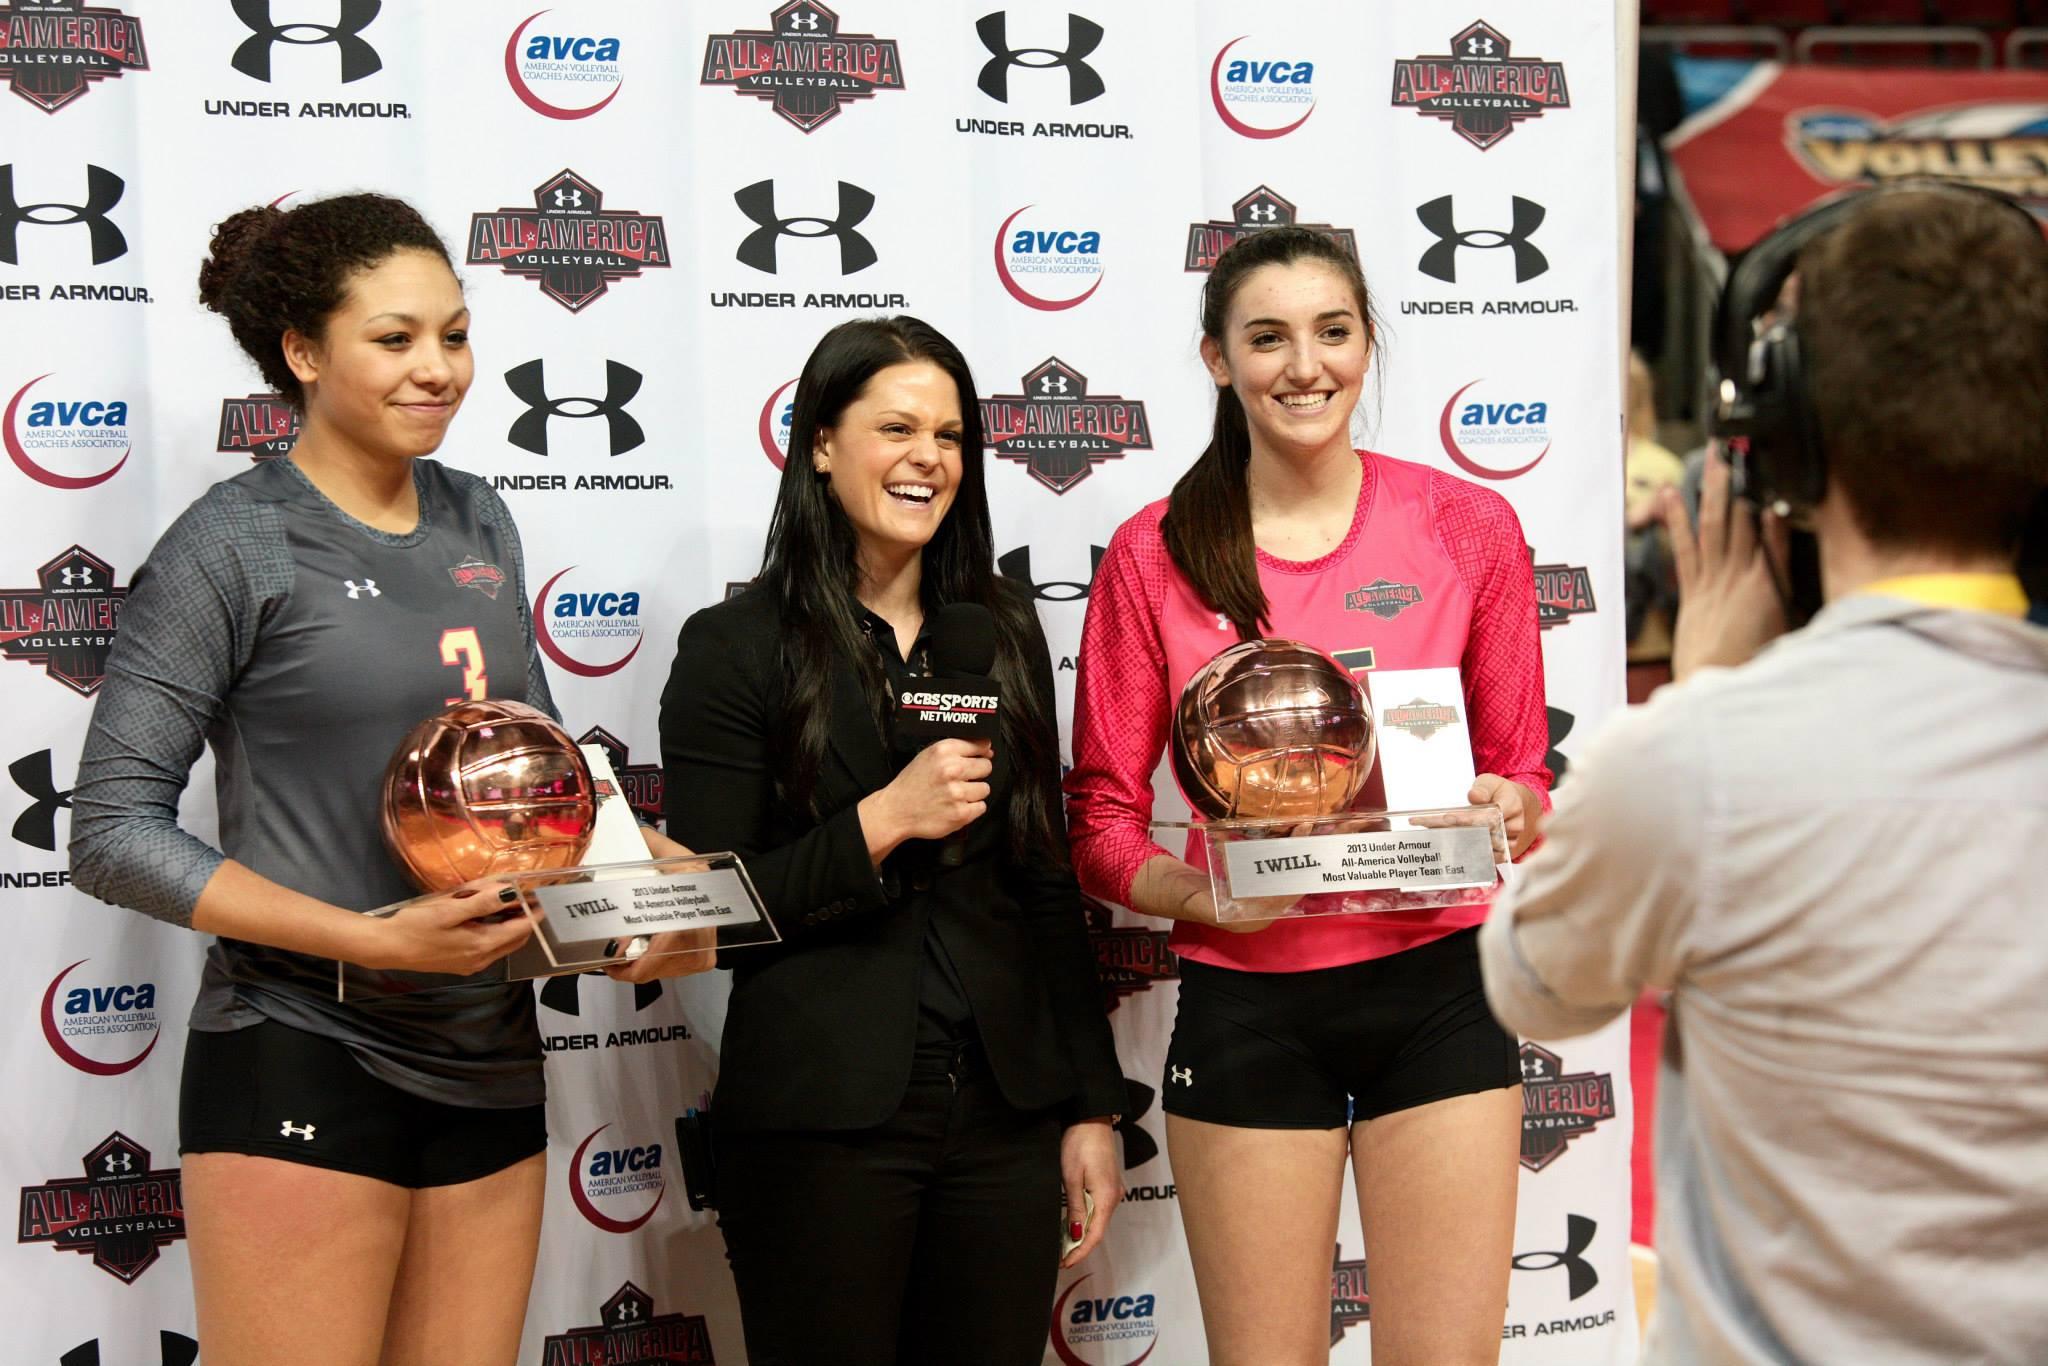 Under Armour All America Volleyball_2012_MVP Awards.jpg